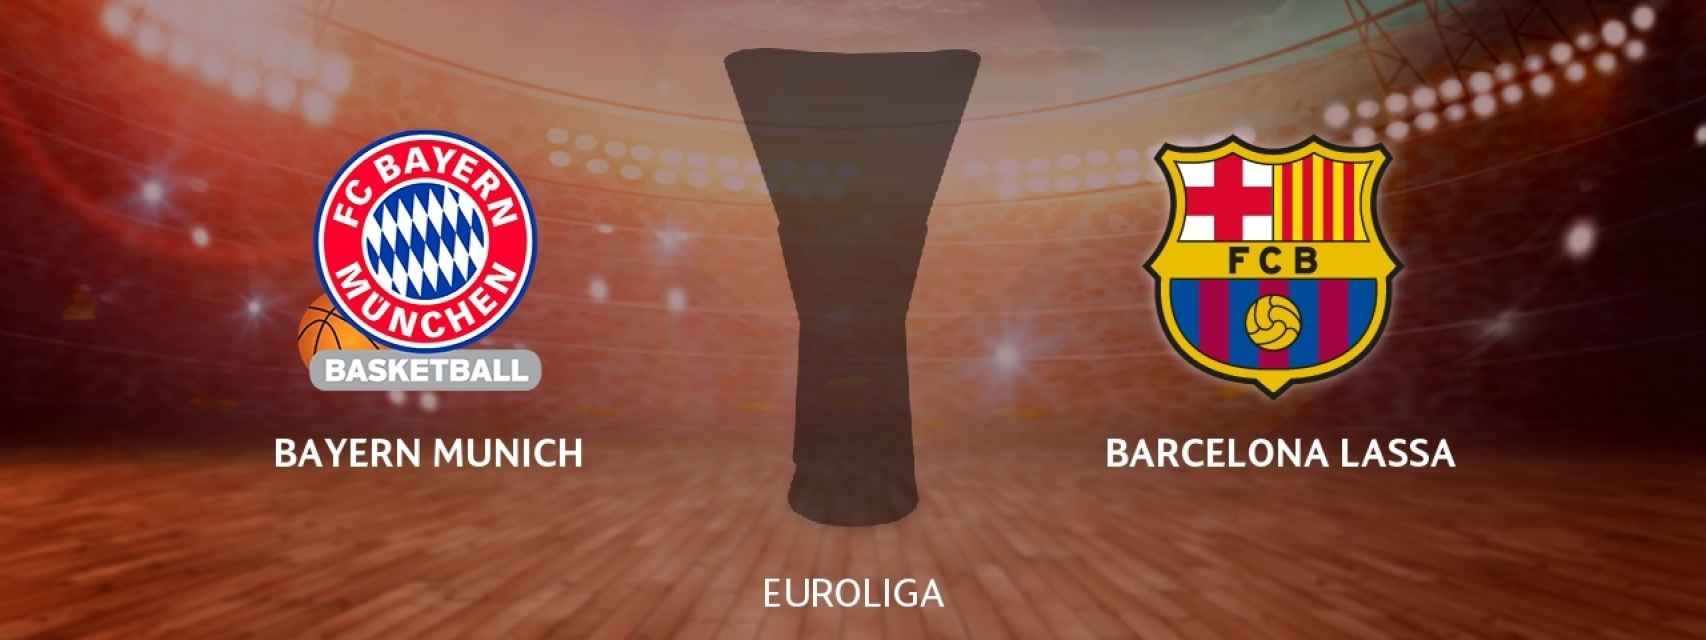 Bayern Munich - Barcelona Lassa